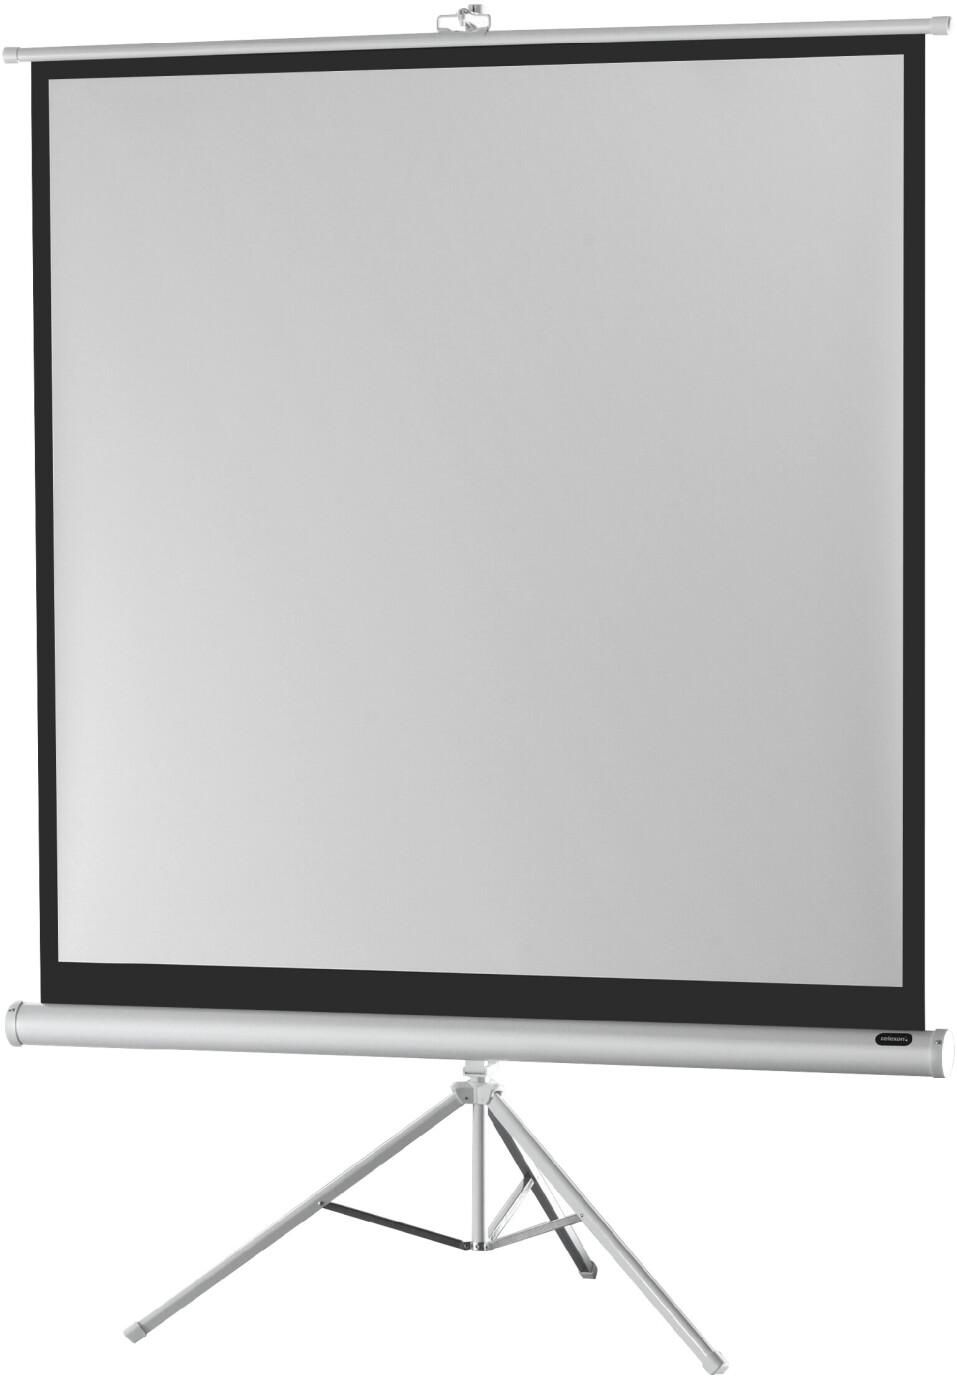 eStore Högkvalitativ Studio Mikrofon - 3,5 mm - White Edition